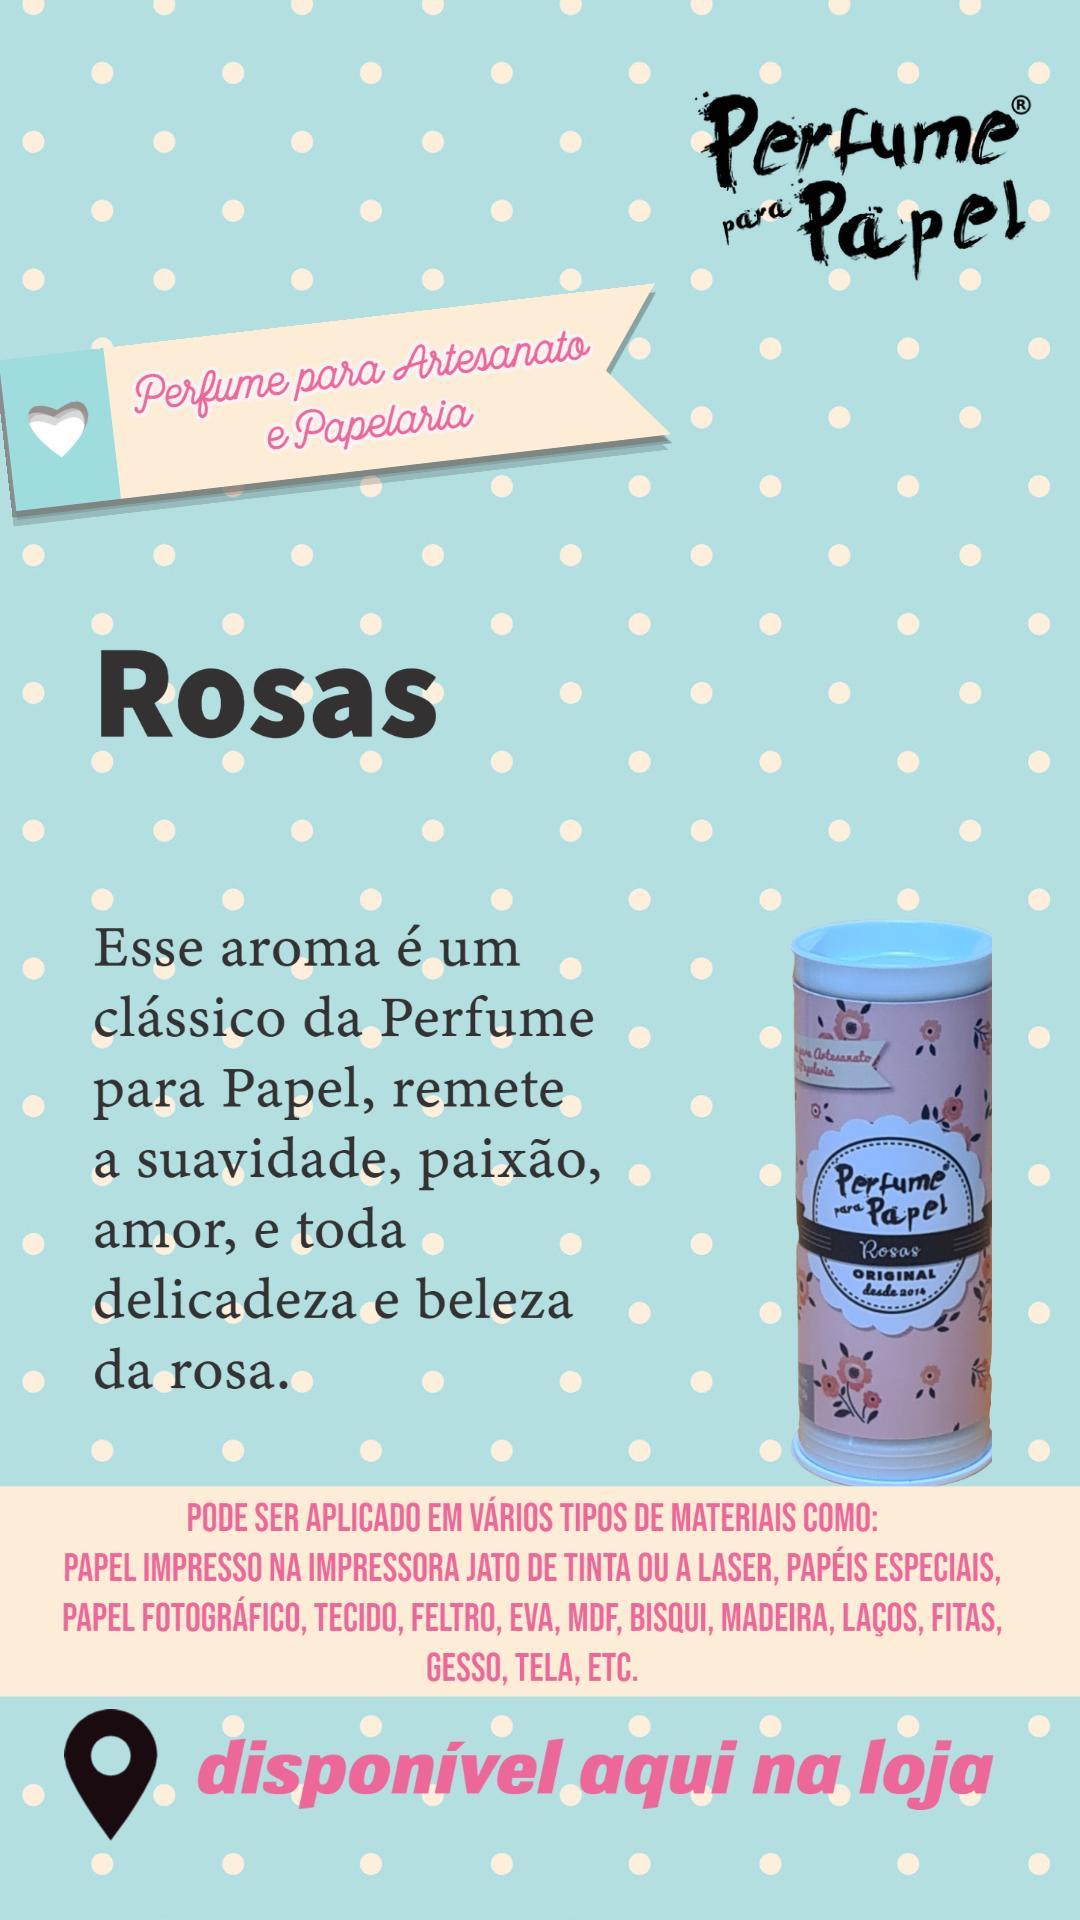 Perfume para Papel Kit Floral com 3 aromas 15 ml cada (Rosas, Rosas Brancas, Garden)